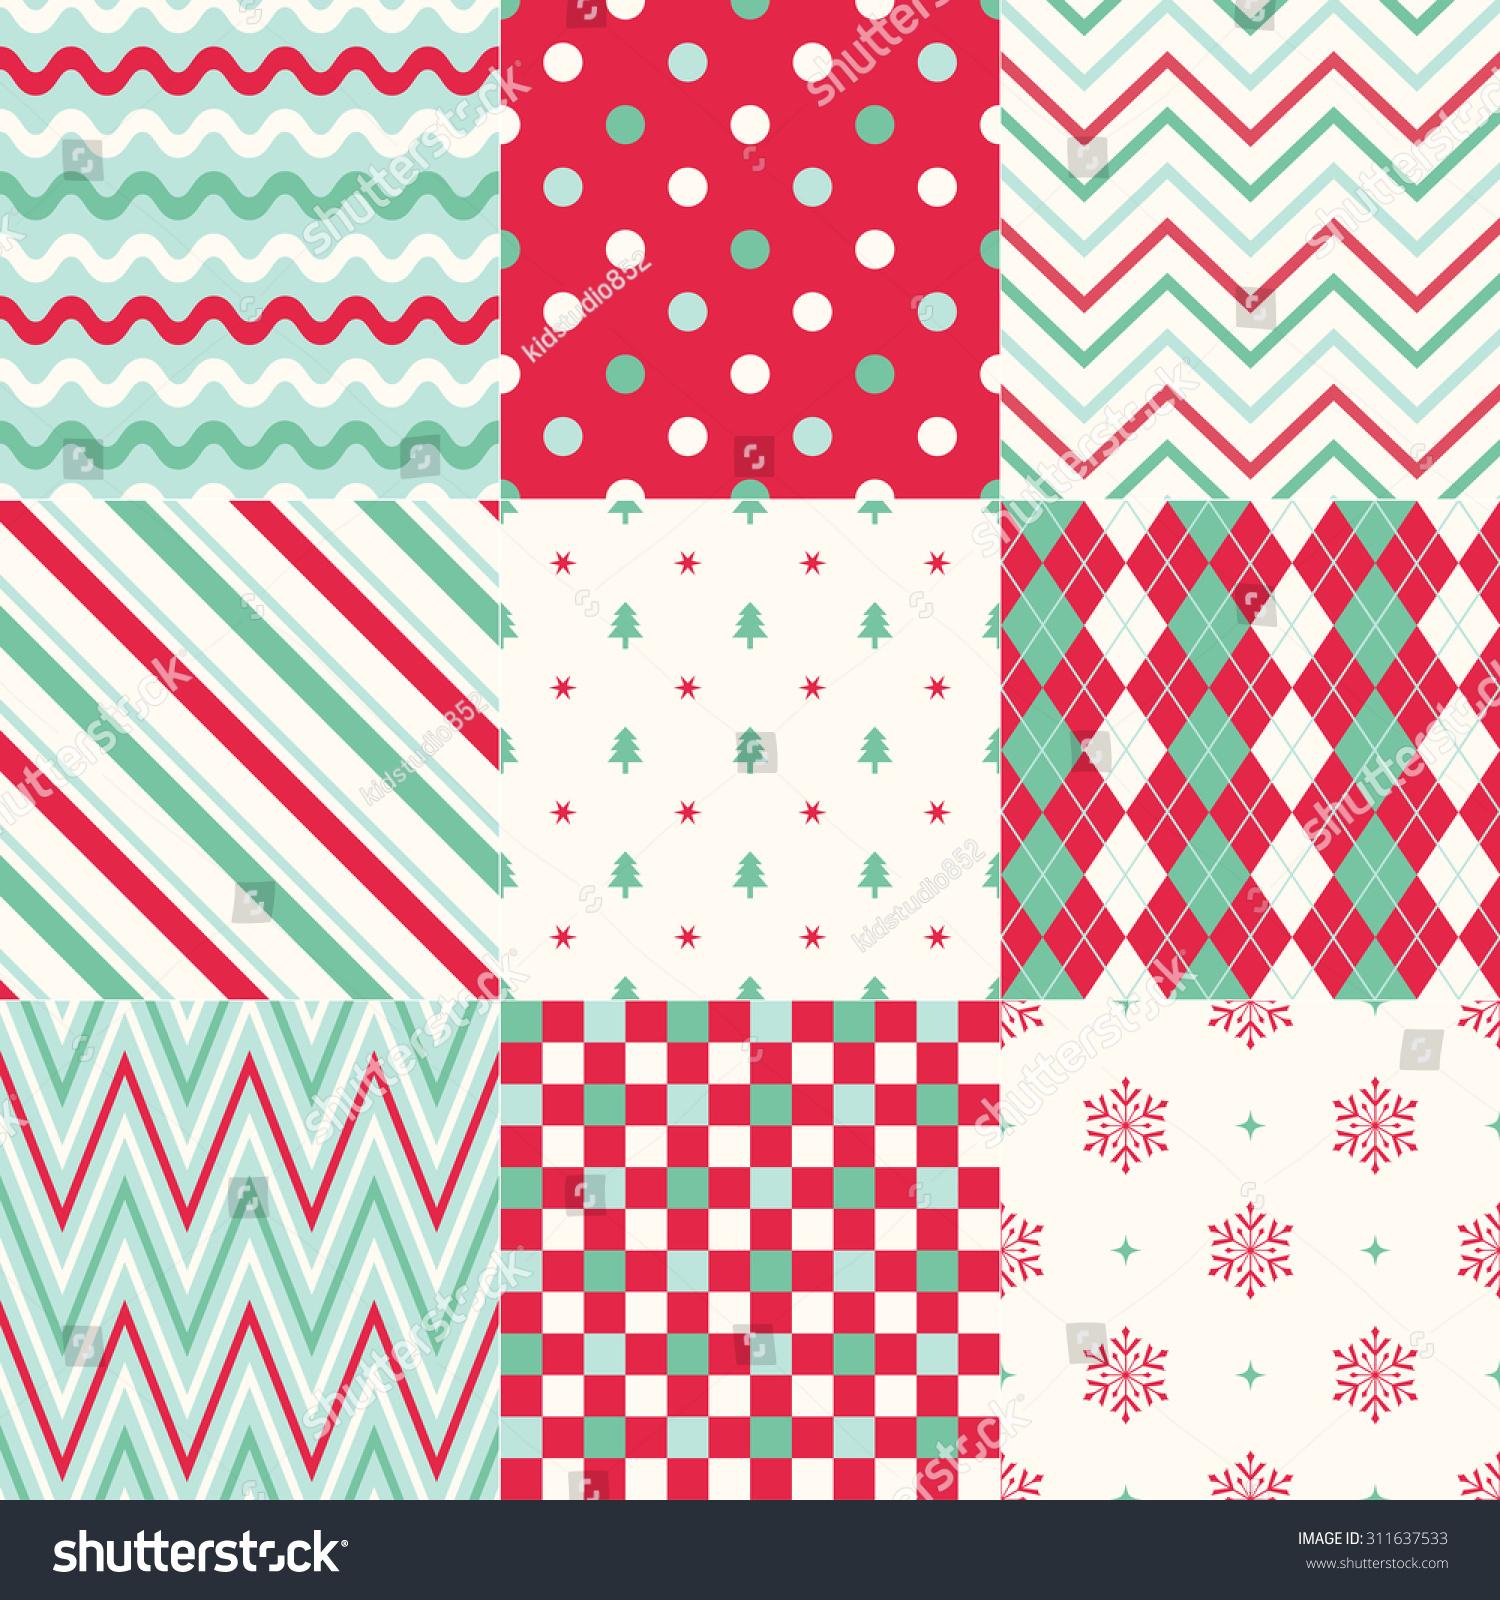 Pics photos merry christmas argyle twitter backgrounds - Seamless Background Christmas Geometric Pattern